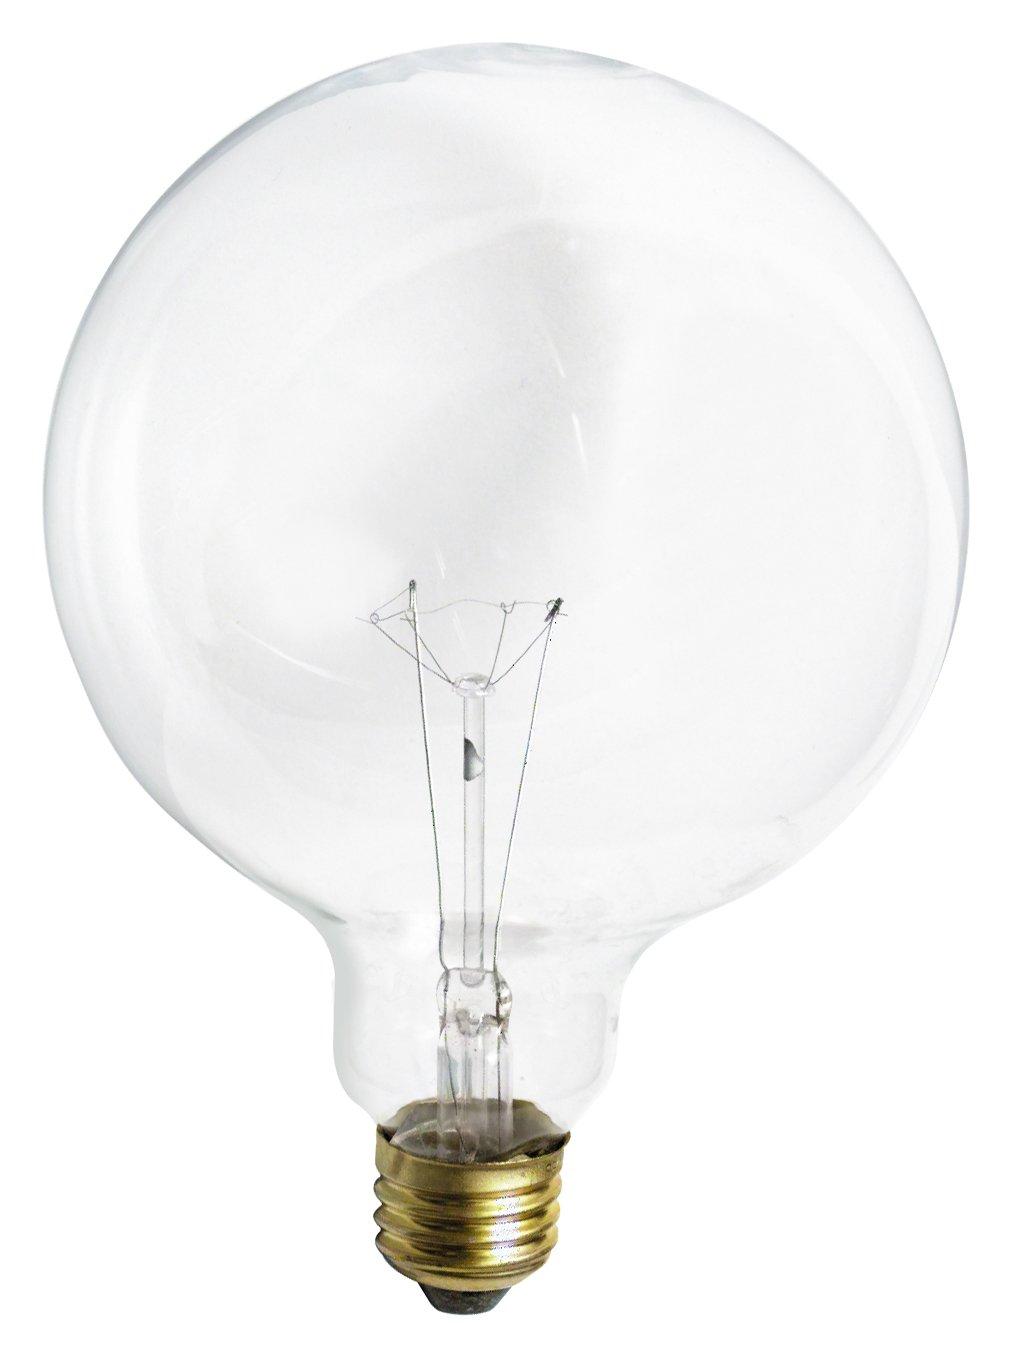 Satco S3013 120-Volt 100-Watt G40 Medium Base Light Bulb CLEAR Box of 6 - ..#G4E435T1 34452-3T672946